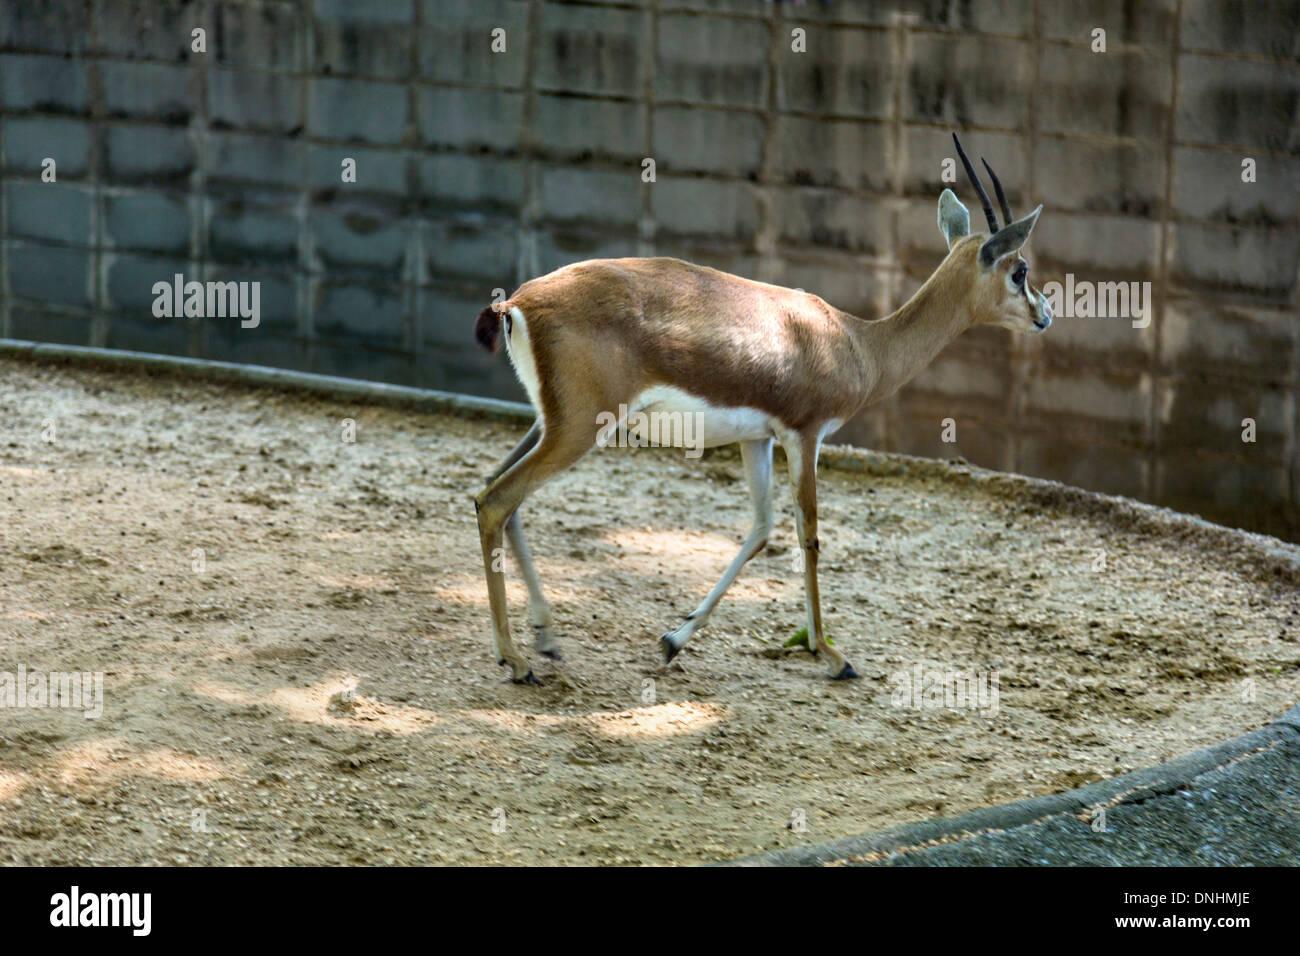 Gazelle in a zoo, Barcelona Zoo, Barcelona, Catalonia, Spain Stock Photo